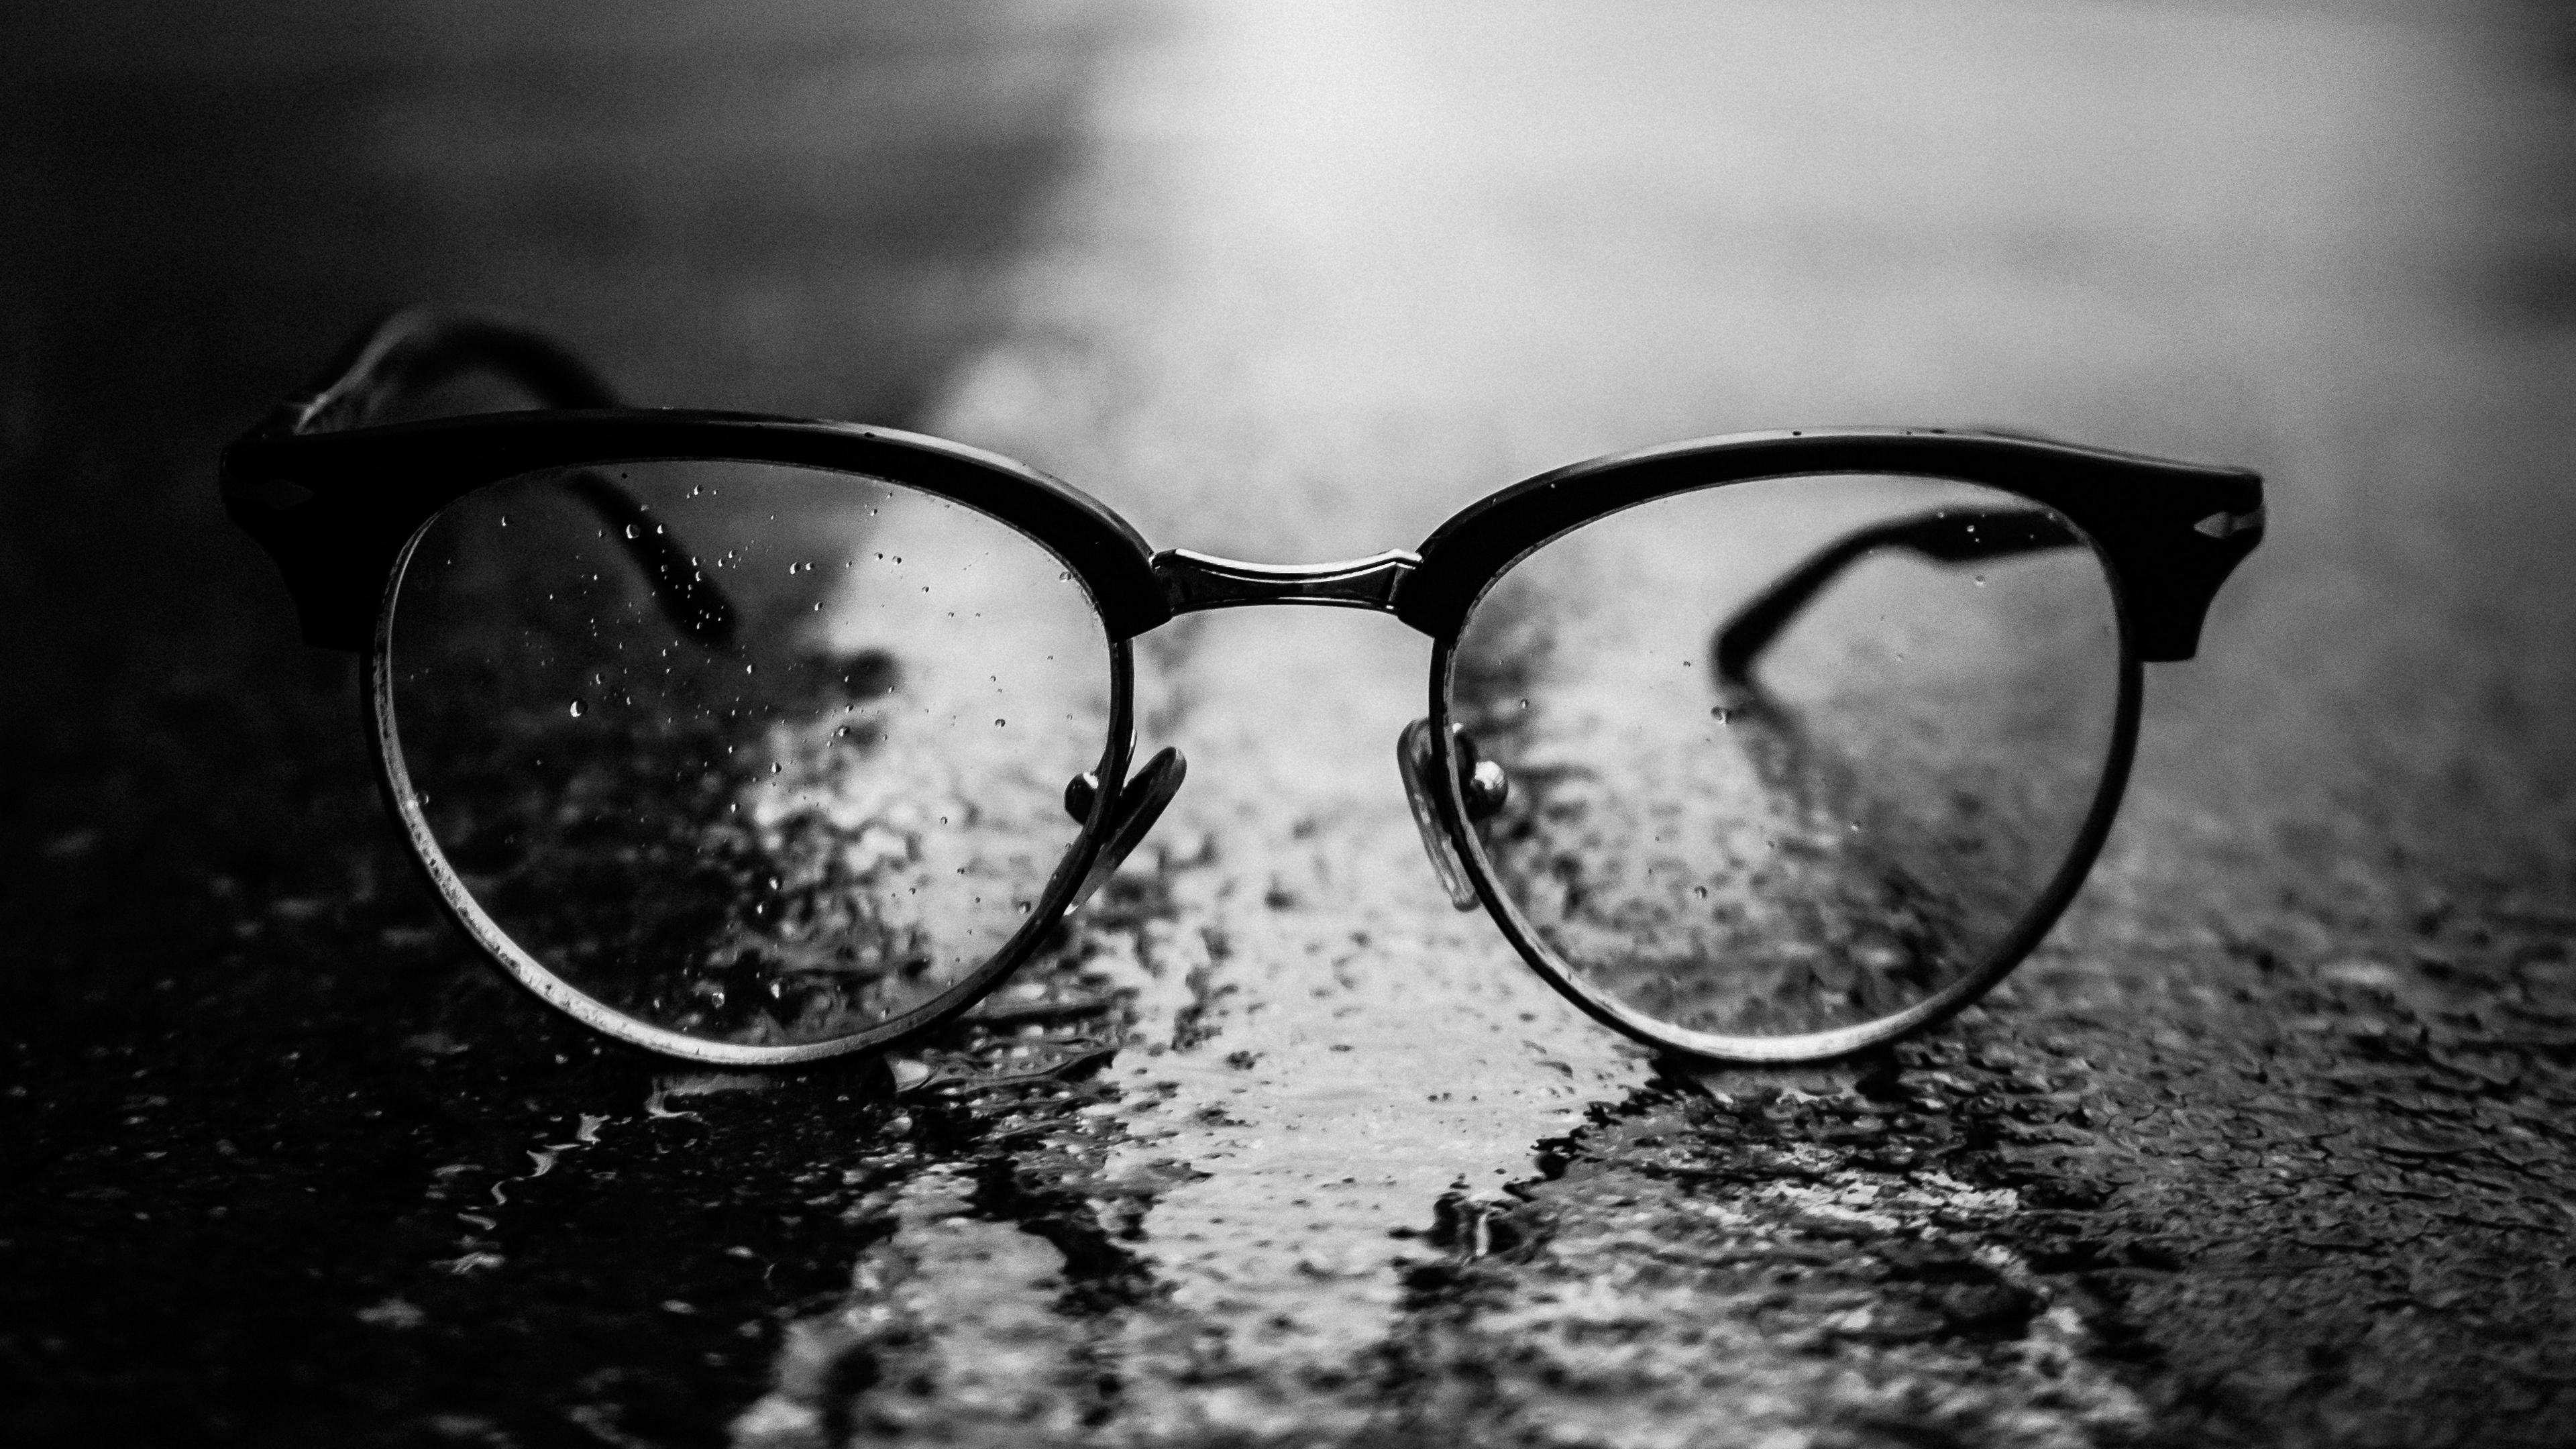 glasses black close up dark 4k 1540575157 - glasses, black, close-up, dark 4k - glasses, close-up, Black